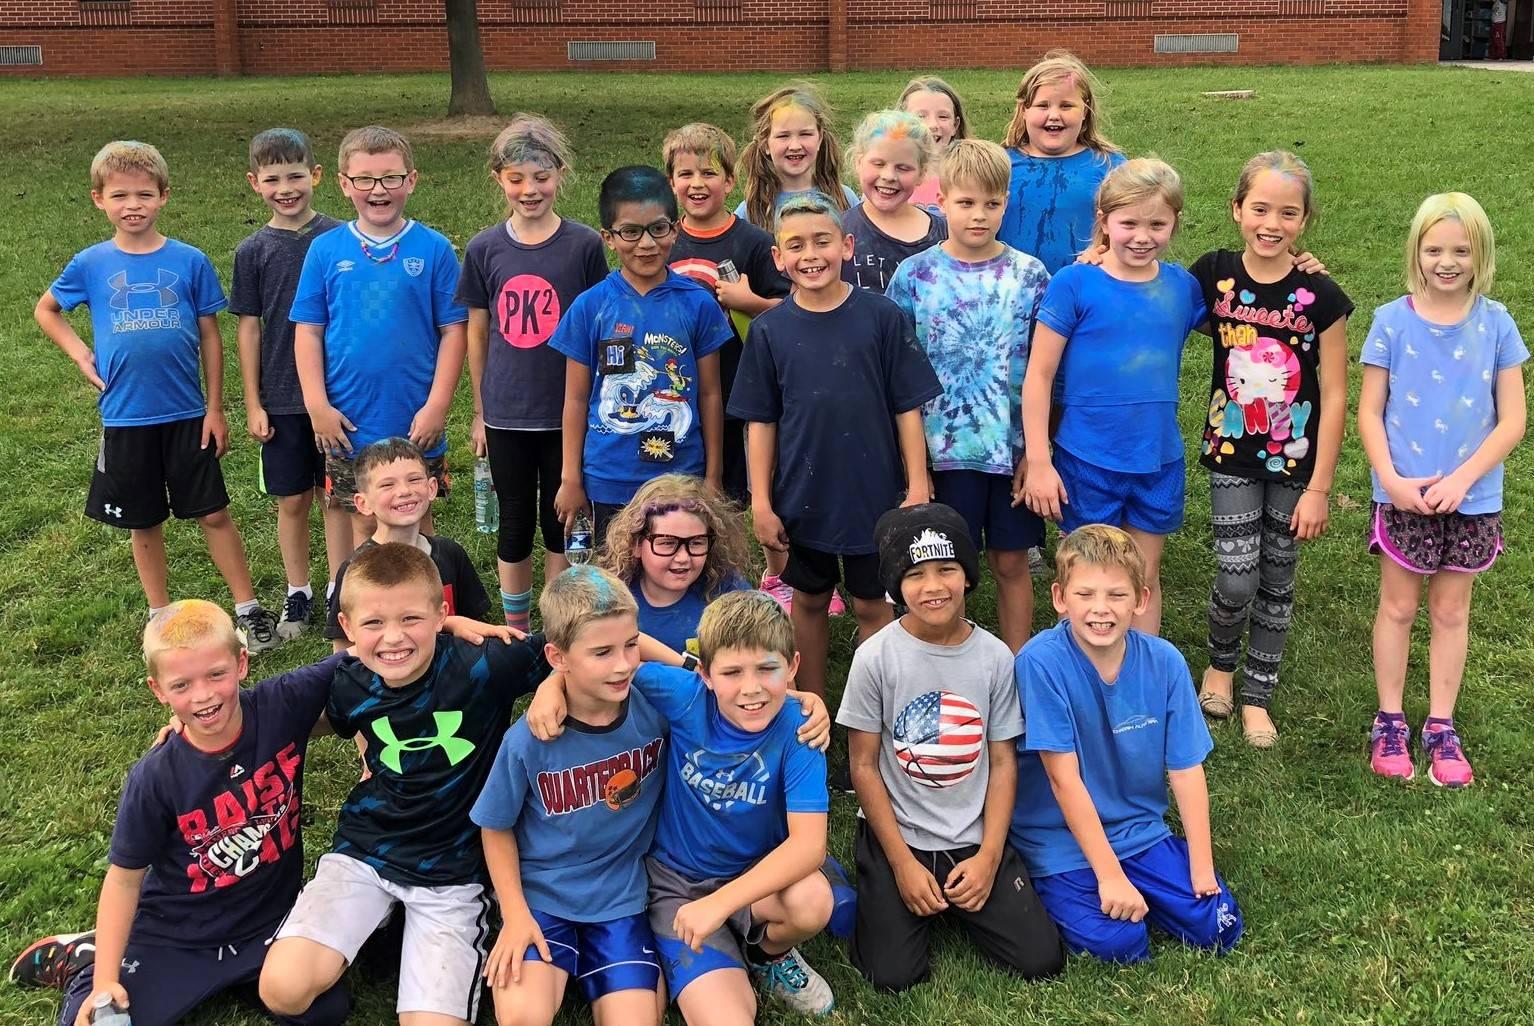 Munson Elementary Fun Run - Fall 2019